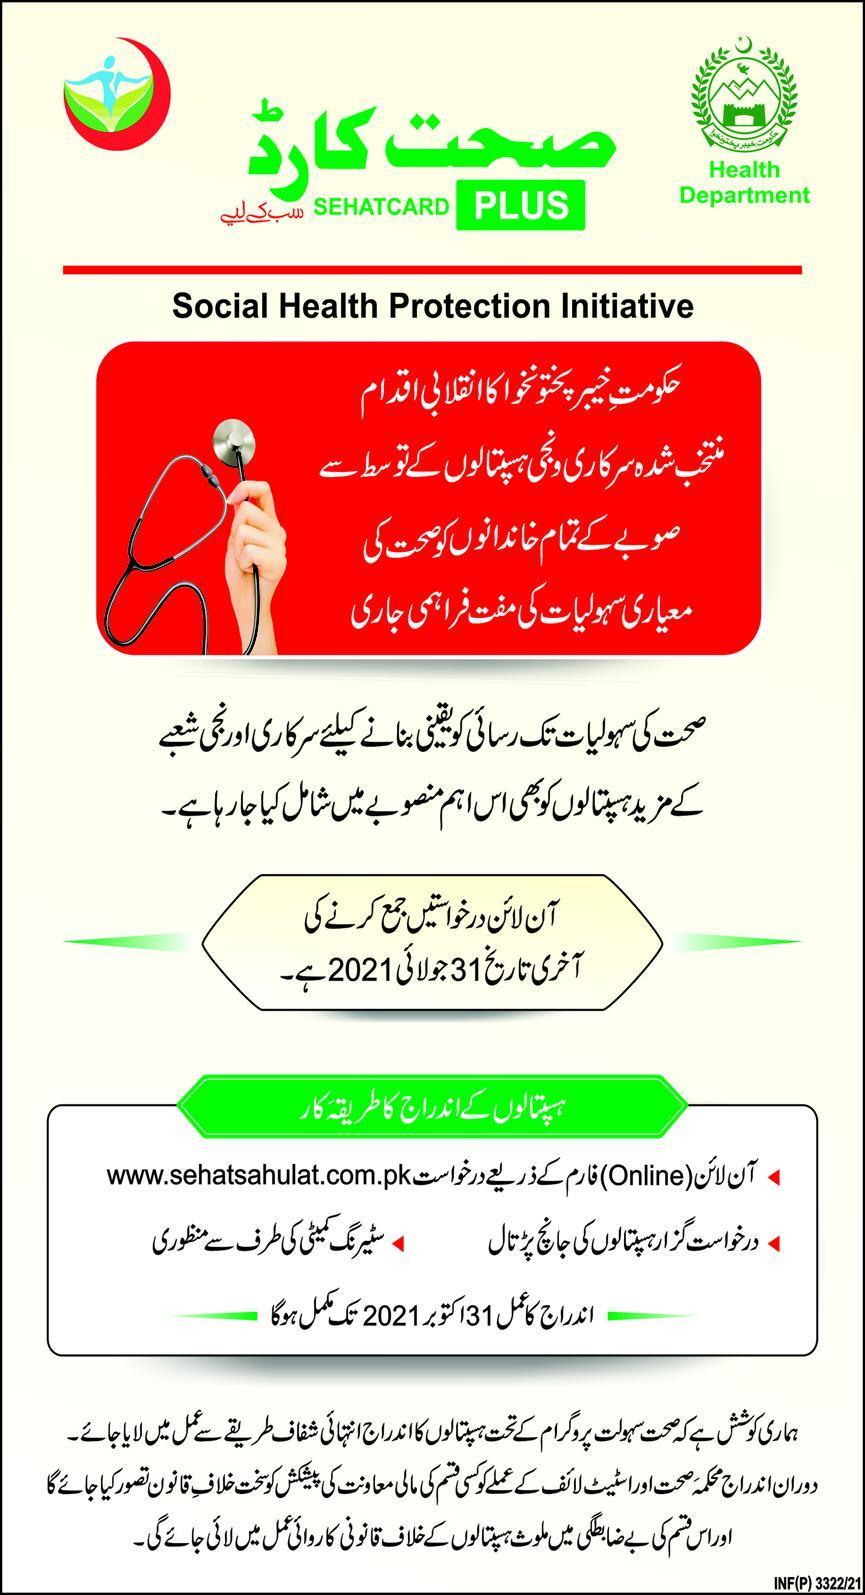 PM Sehat Card Plus Scheme in Pakistan